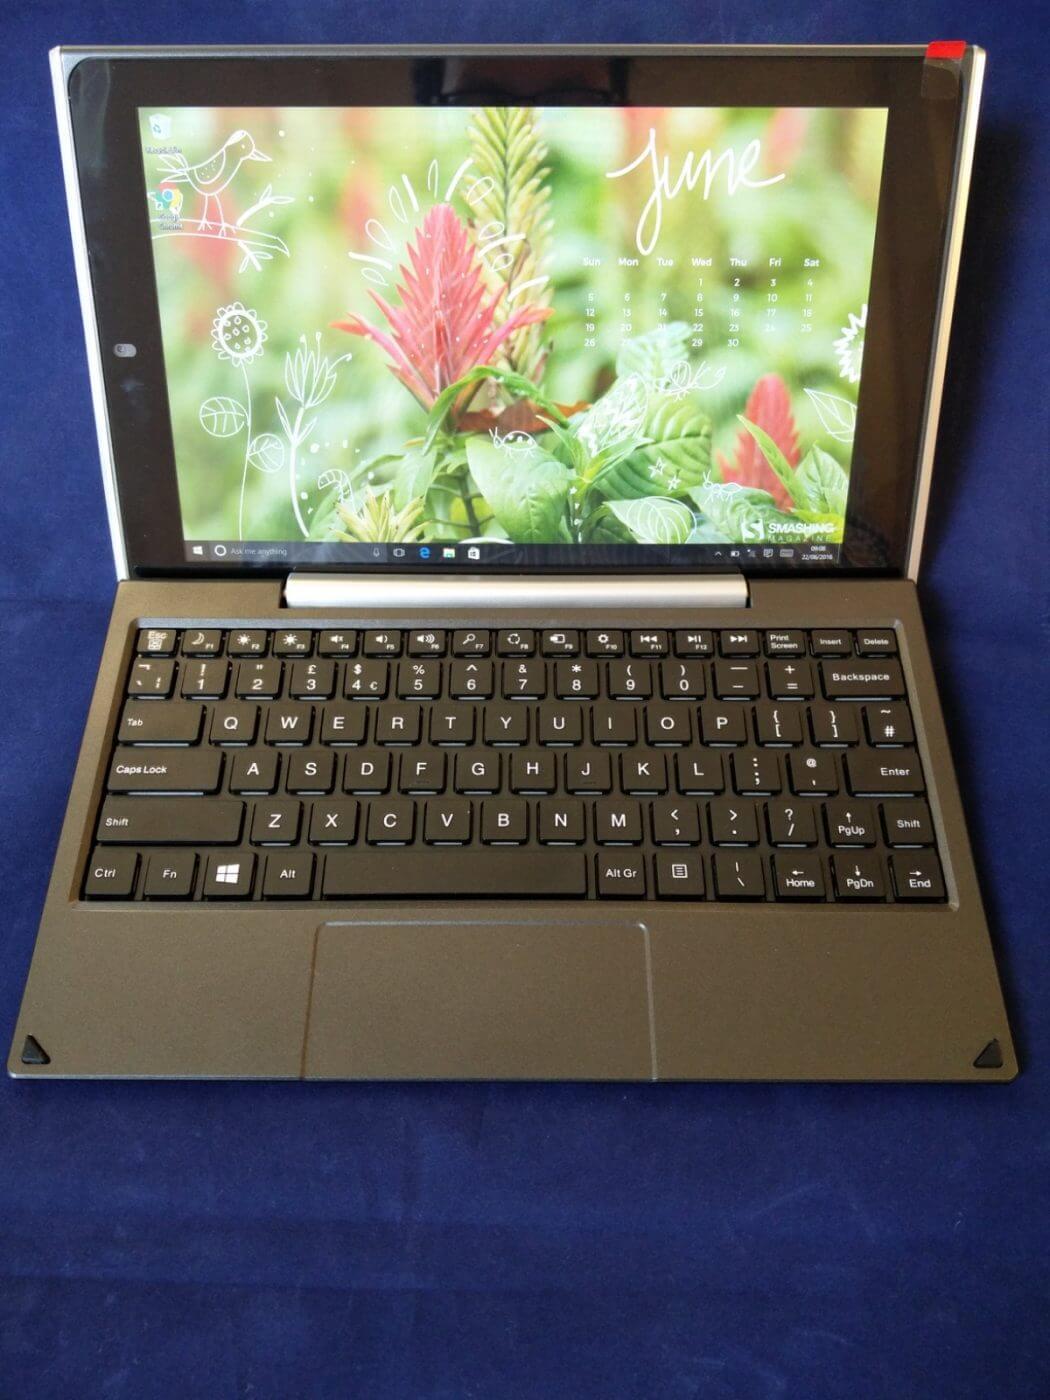 BravoWin Hybrid Tablet